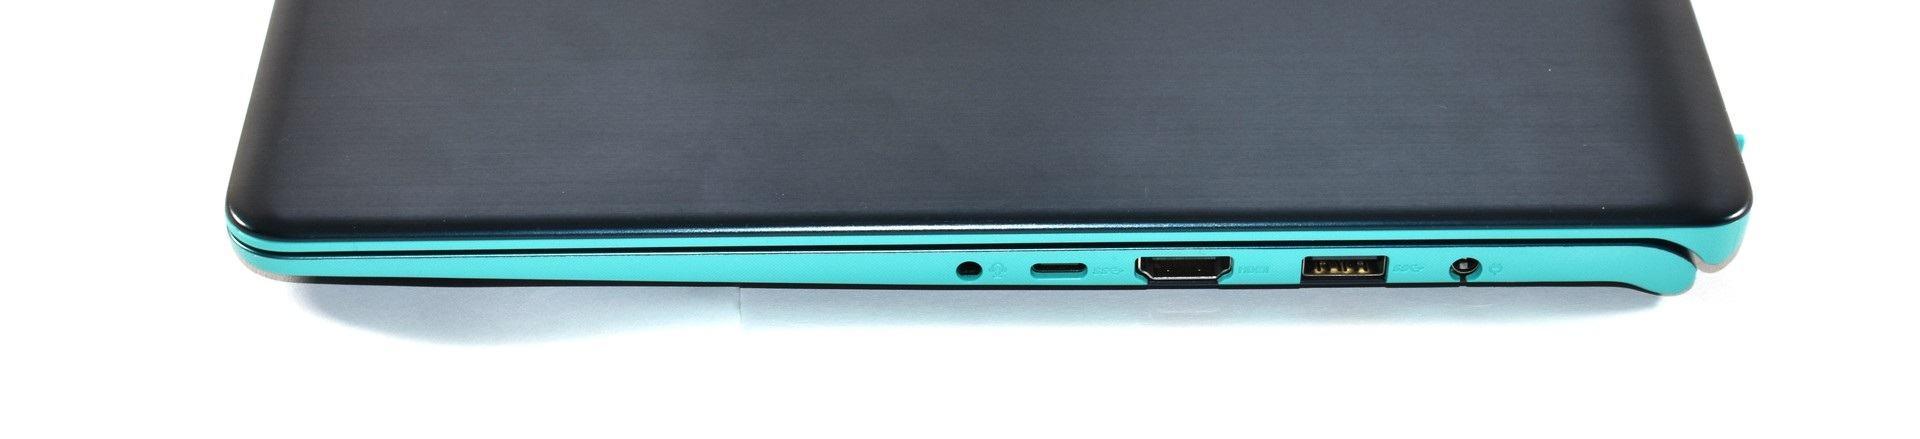 đánh giá laptop Asus VivoBook S15 S530UN